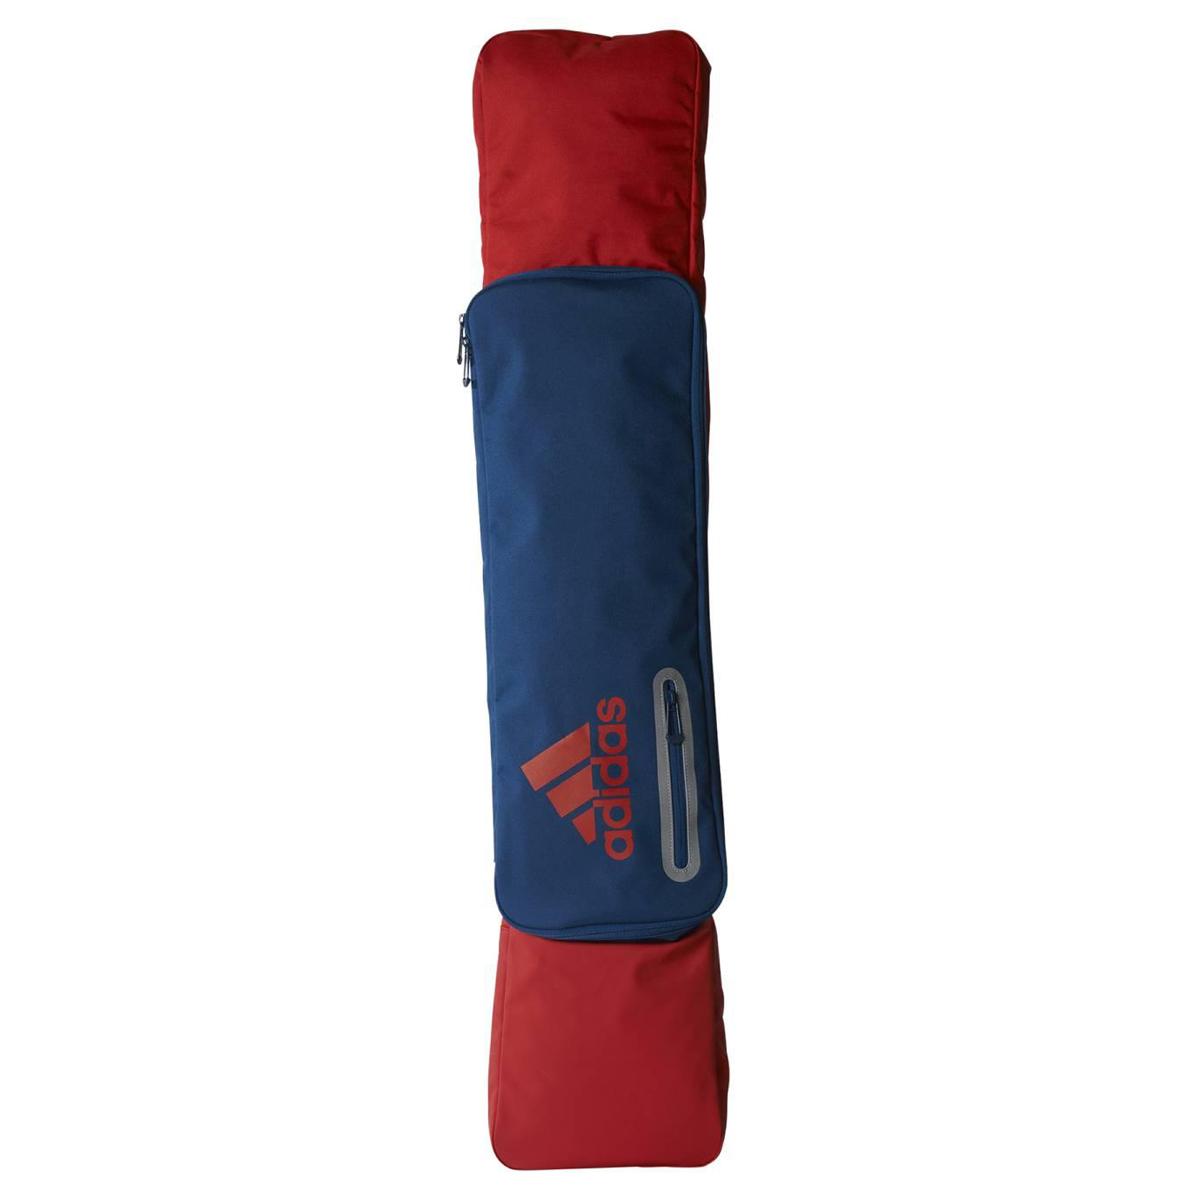 52d4679c262 Adidas Hockey Stickbag Hockeytas ROOD/BLAUW online kopen bij ...